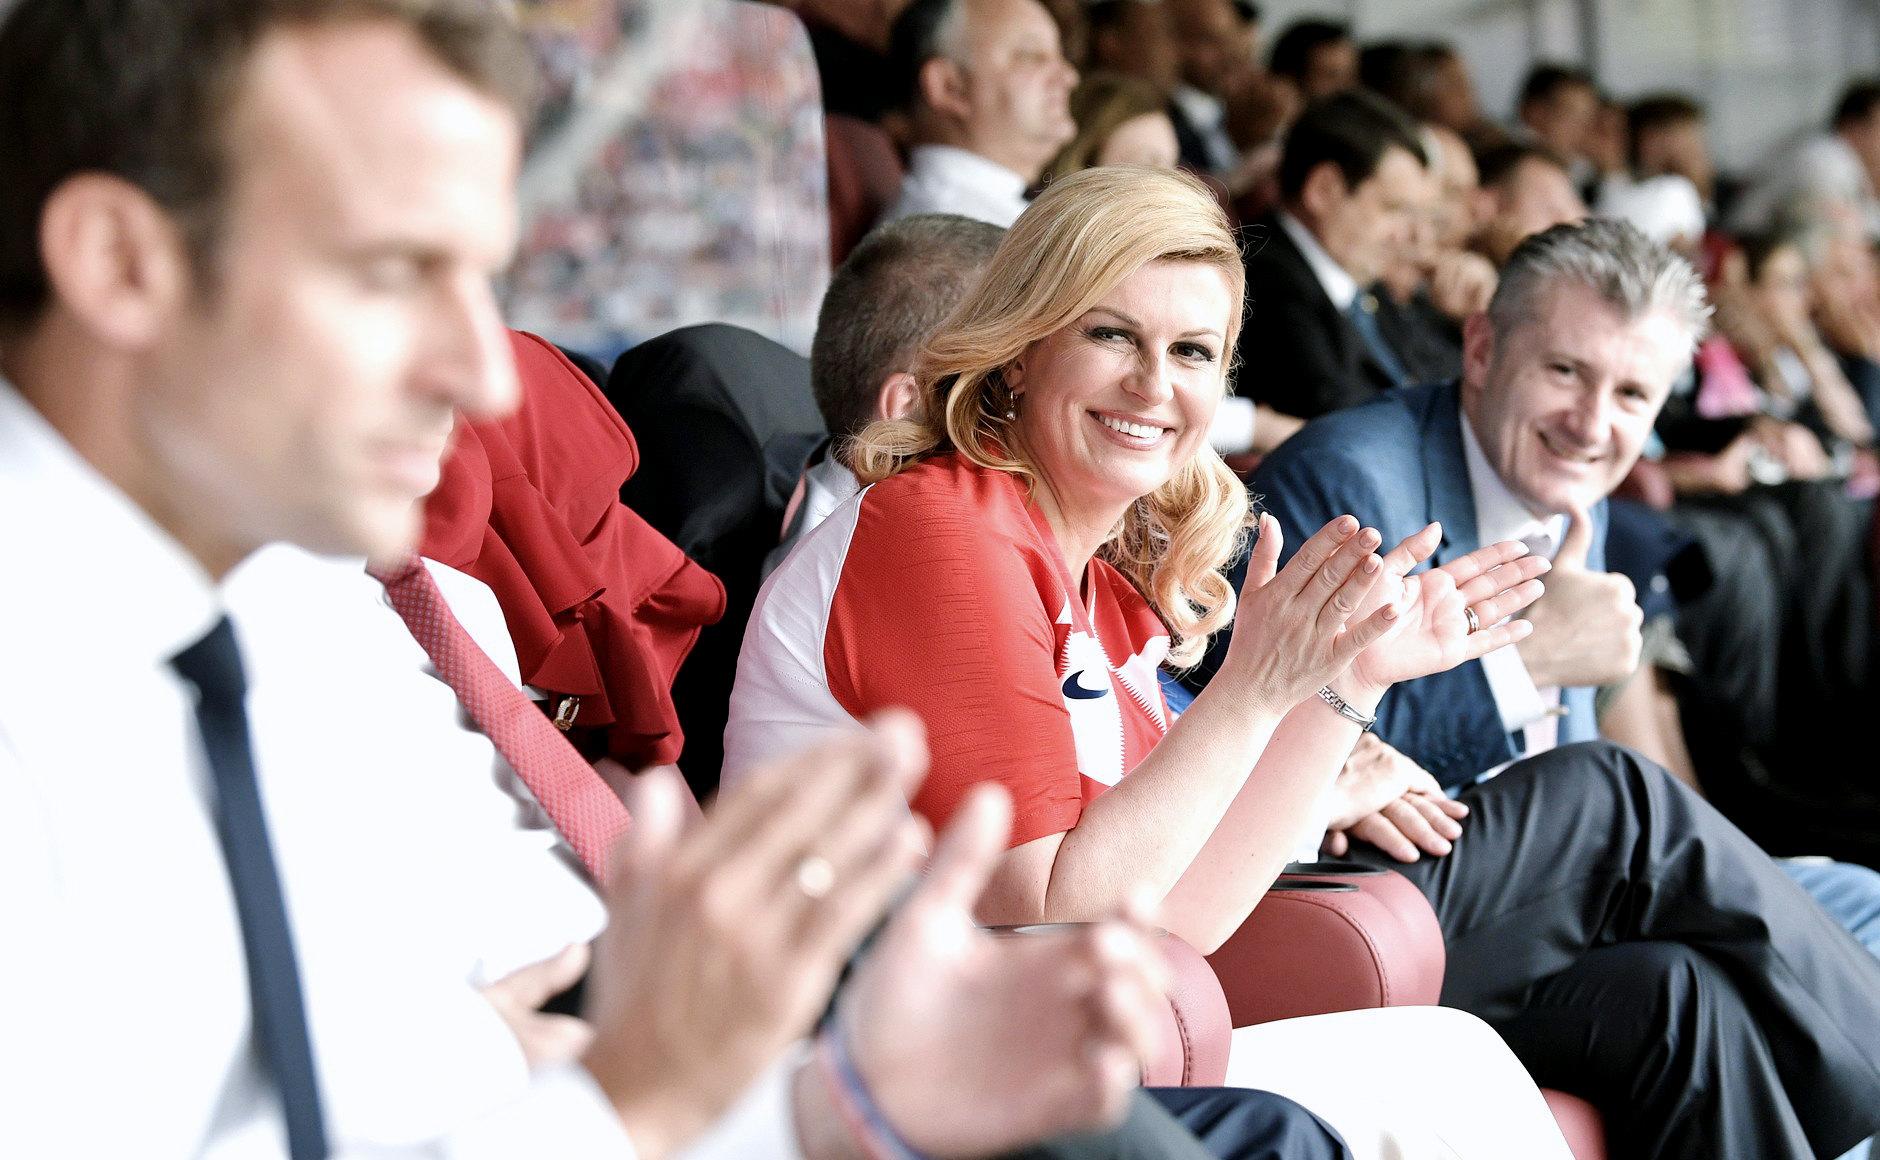 Президент Хорватии Колинда Грабар-Китарович нафинальном матче чемпионата мира пофутболу